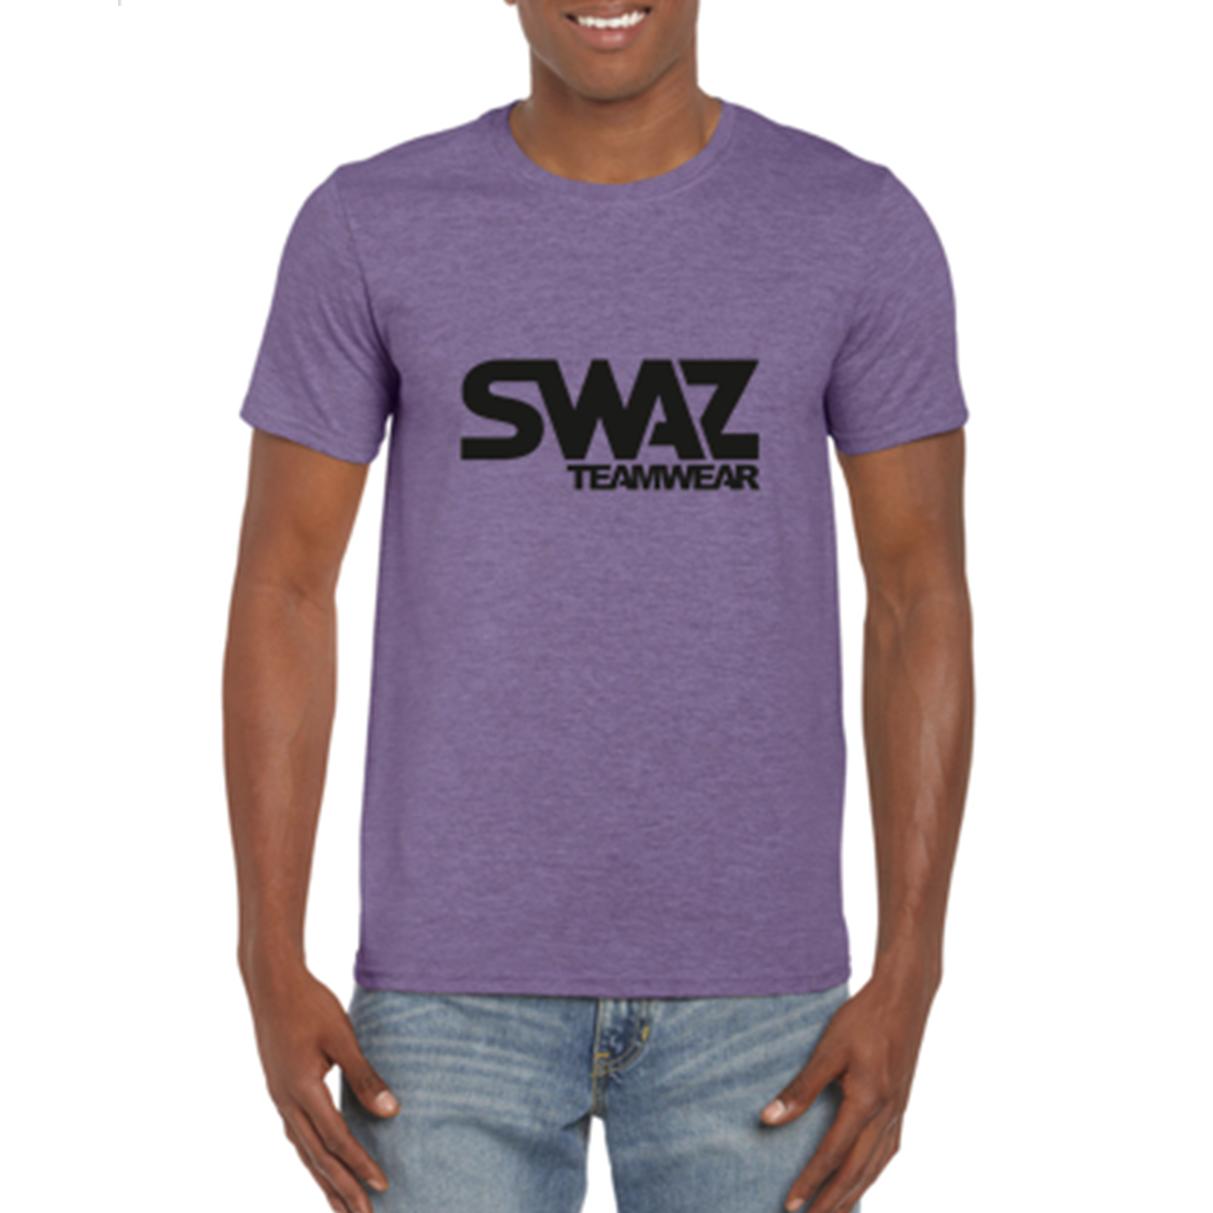 SWAZ Teamwear Heather Purple Classic T-Shirt